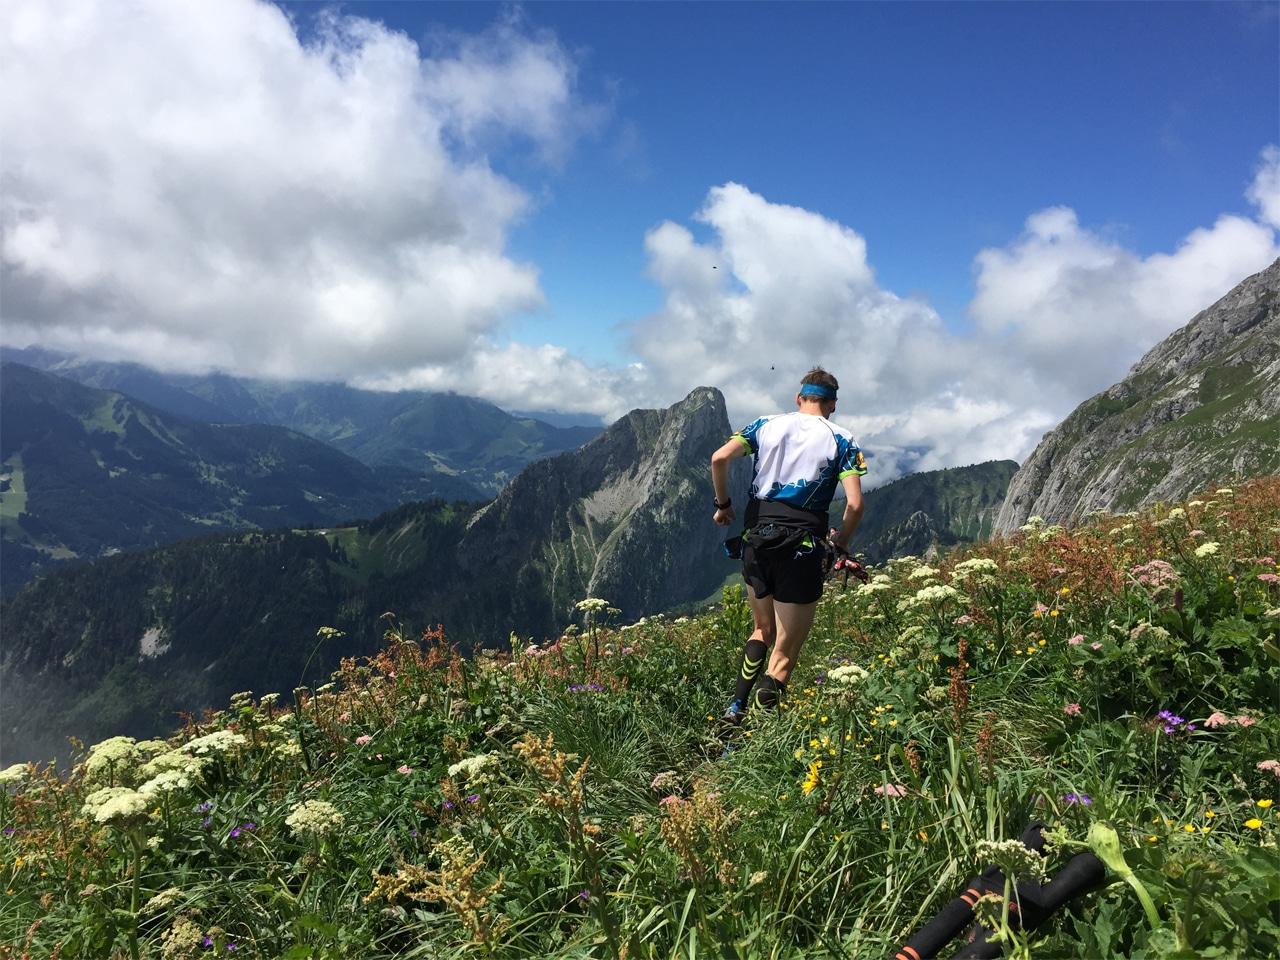 Trailrunning - Thomas bij Cornettes